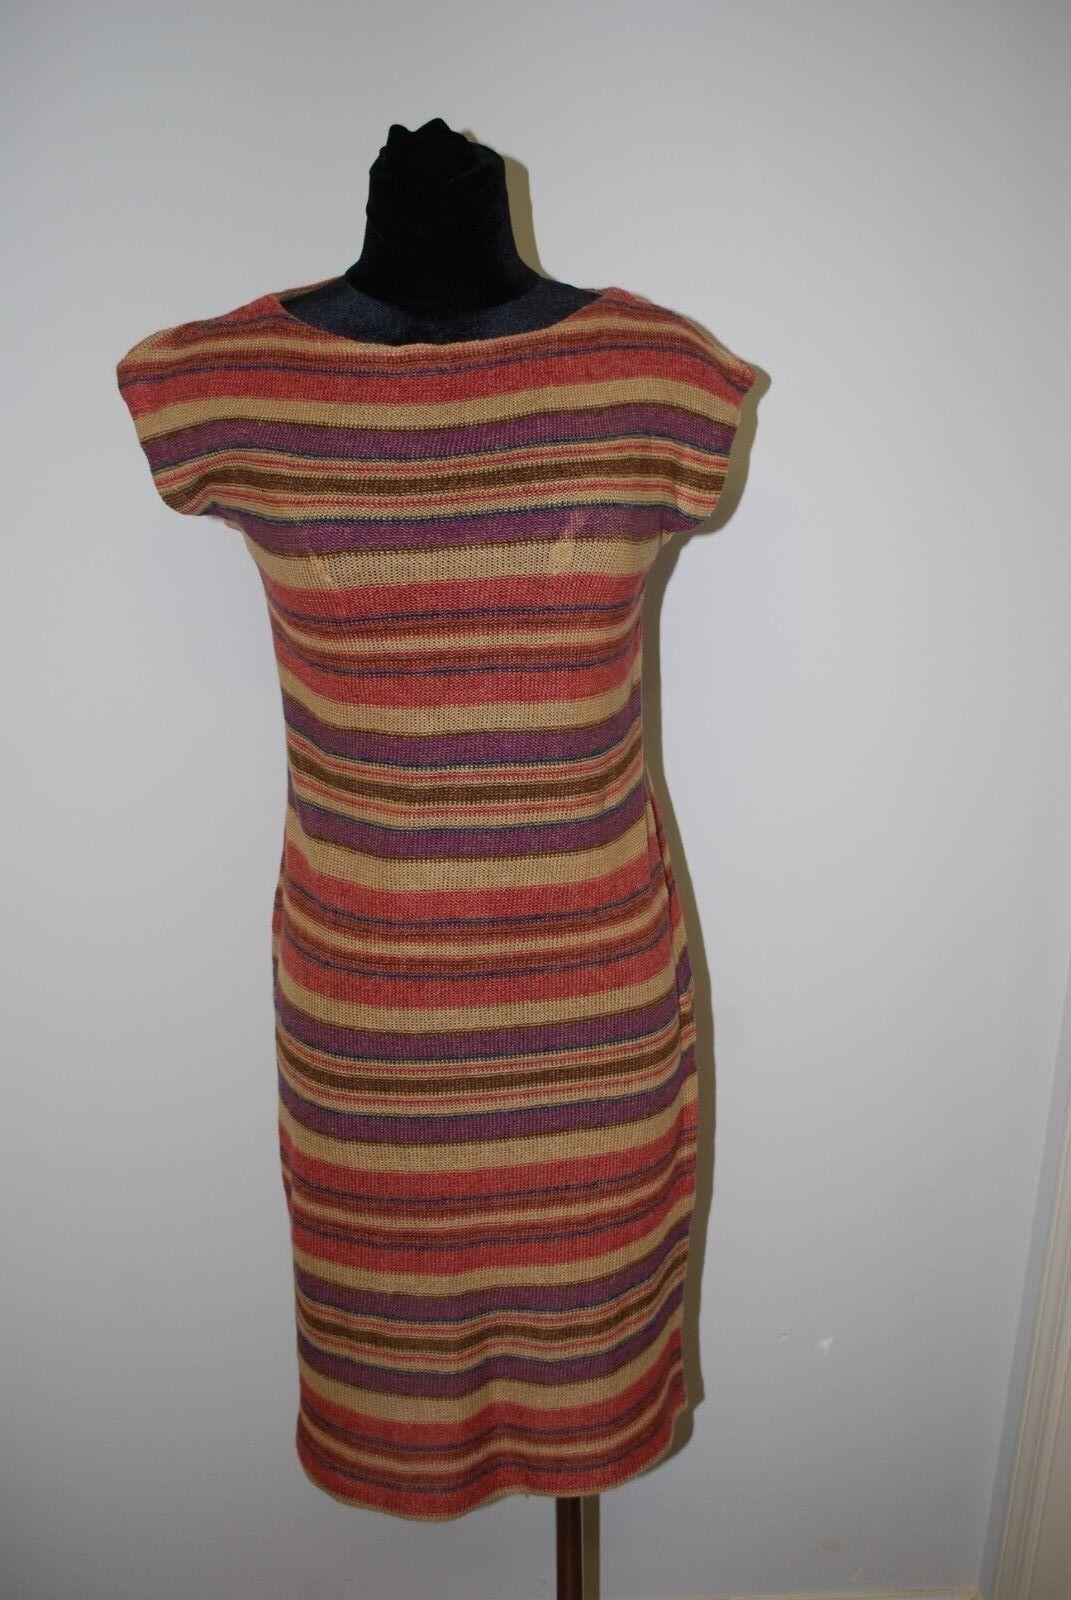 New Ralph Lauren Linen Silk Tan Multi Stripe Sweater Dress Fall colors Sz SMALL